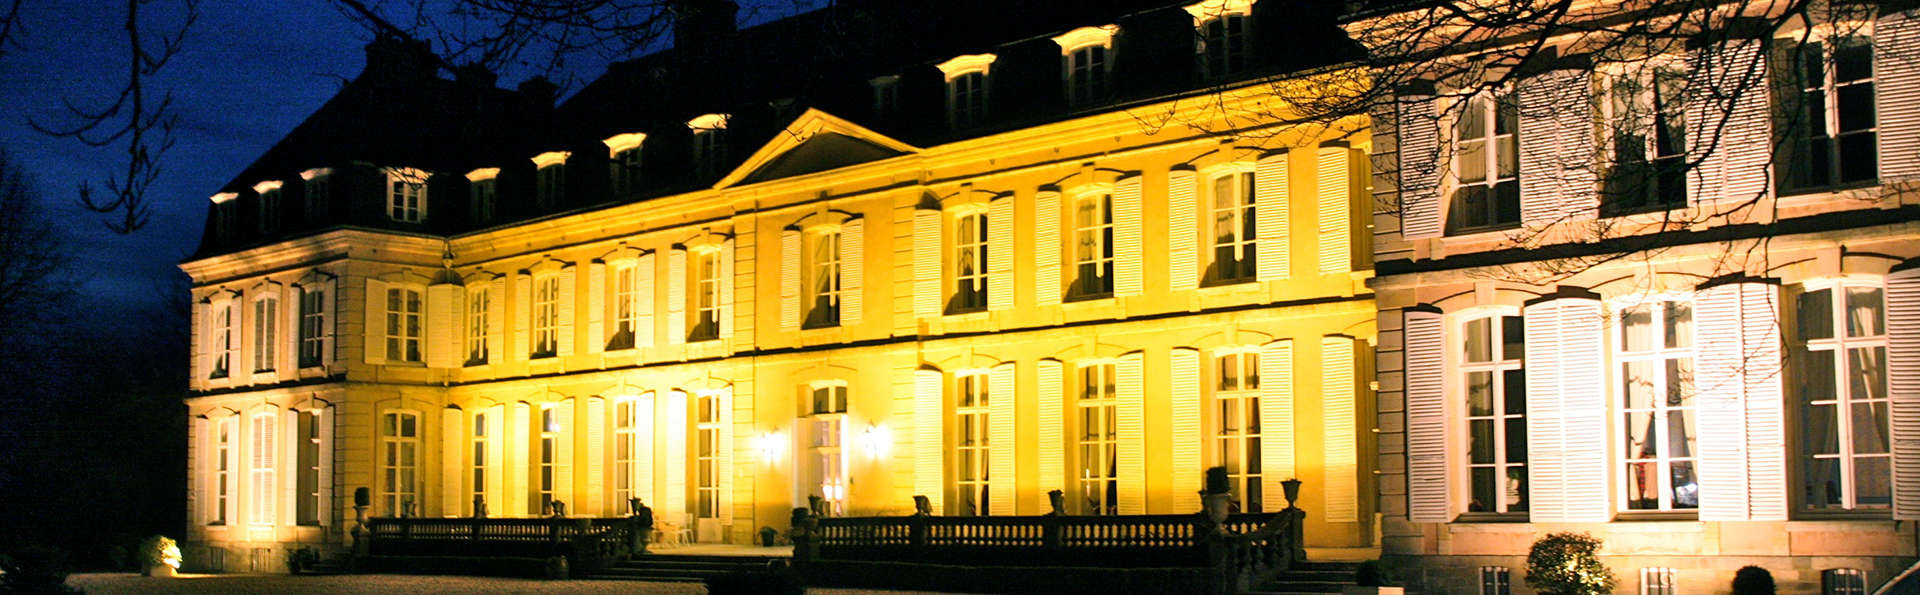 Château de Sissi - edit_front_night.jpg